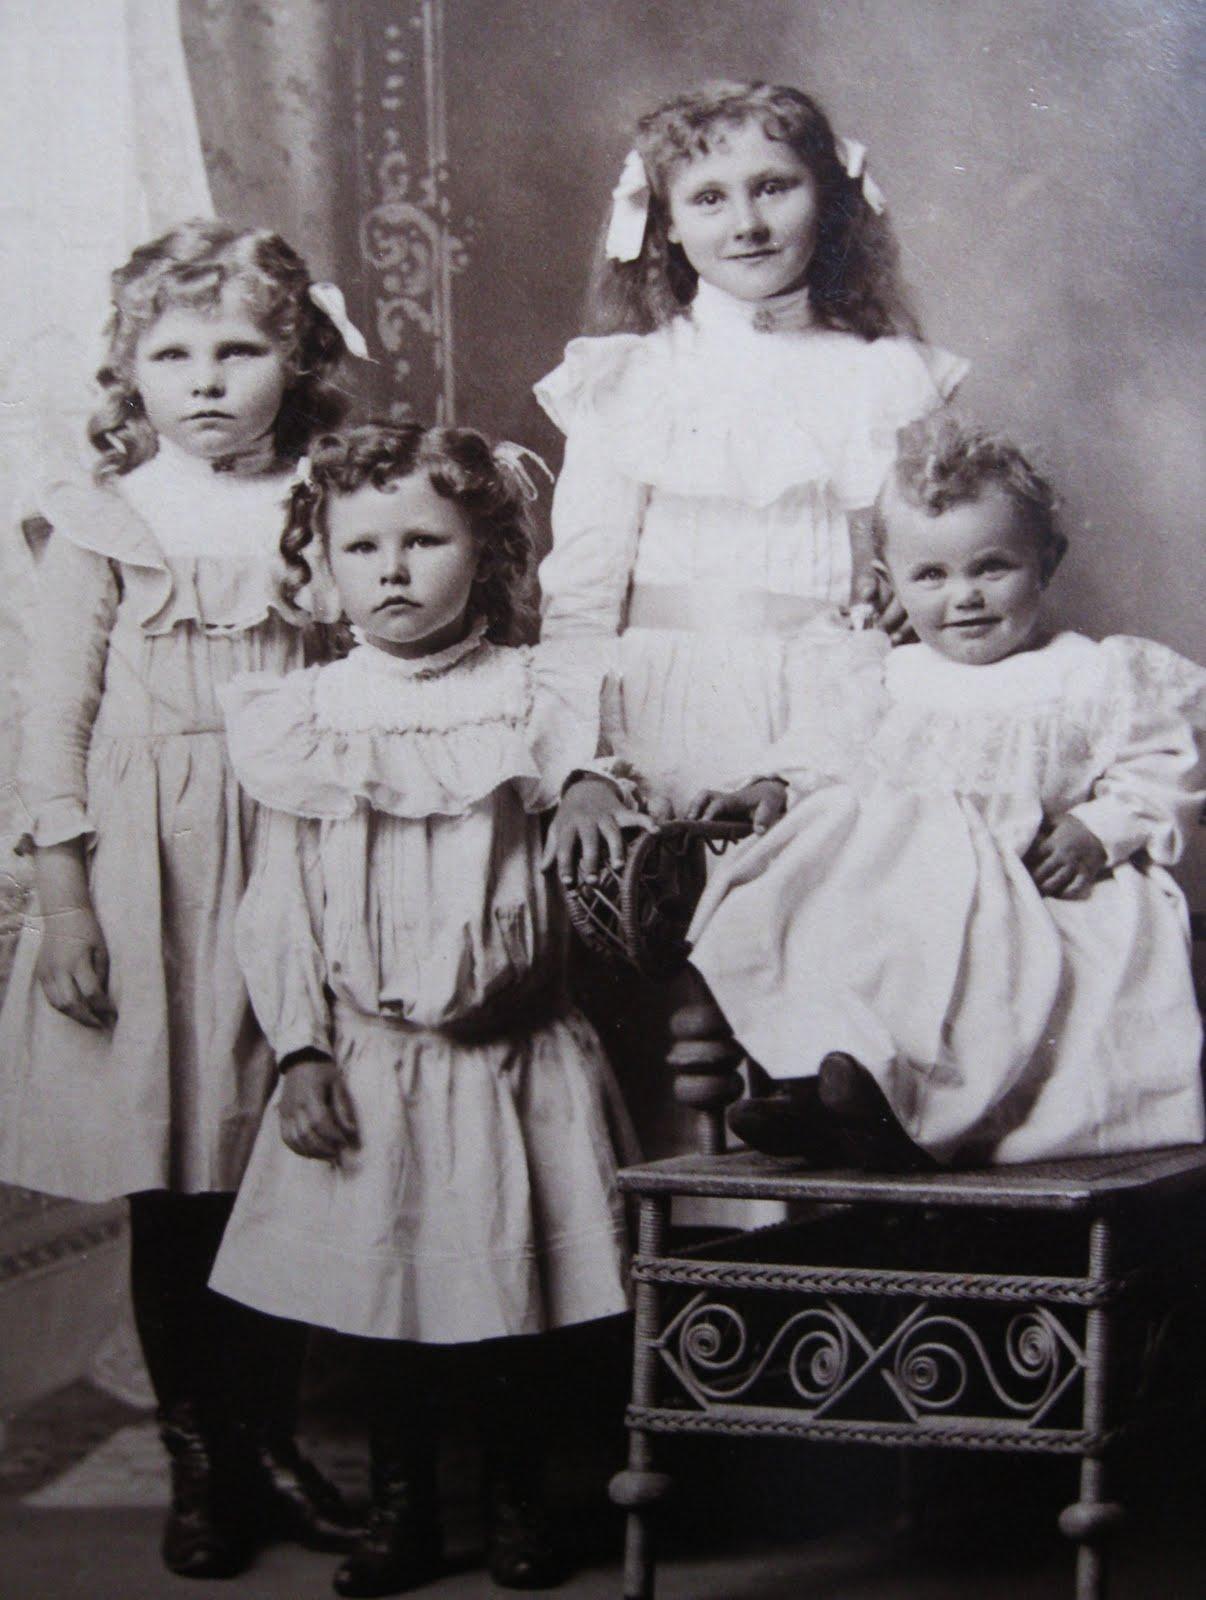 cape cod washashore: sharing victorian photographs